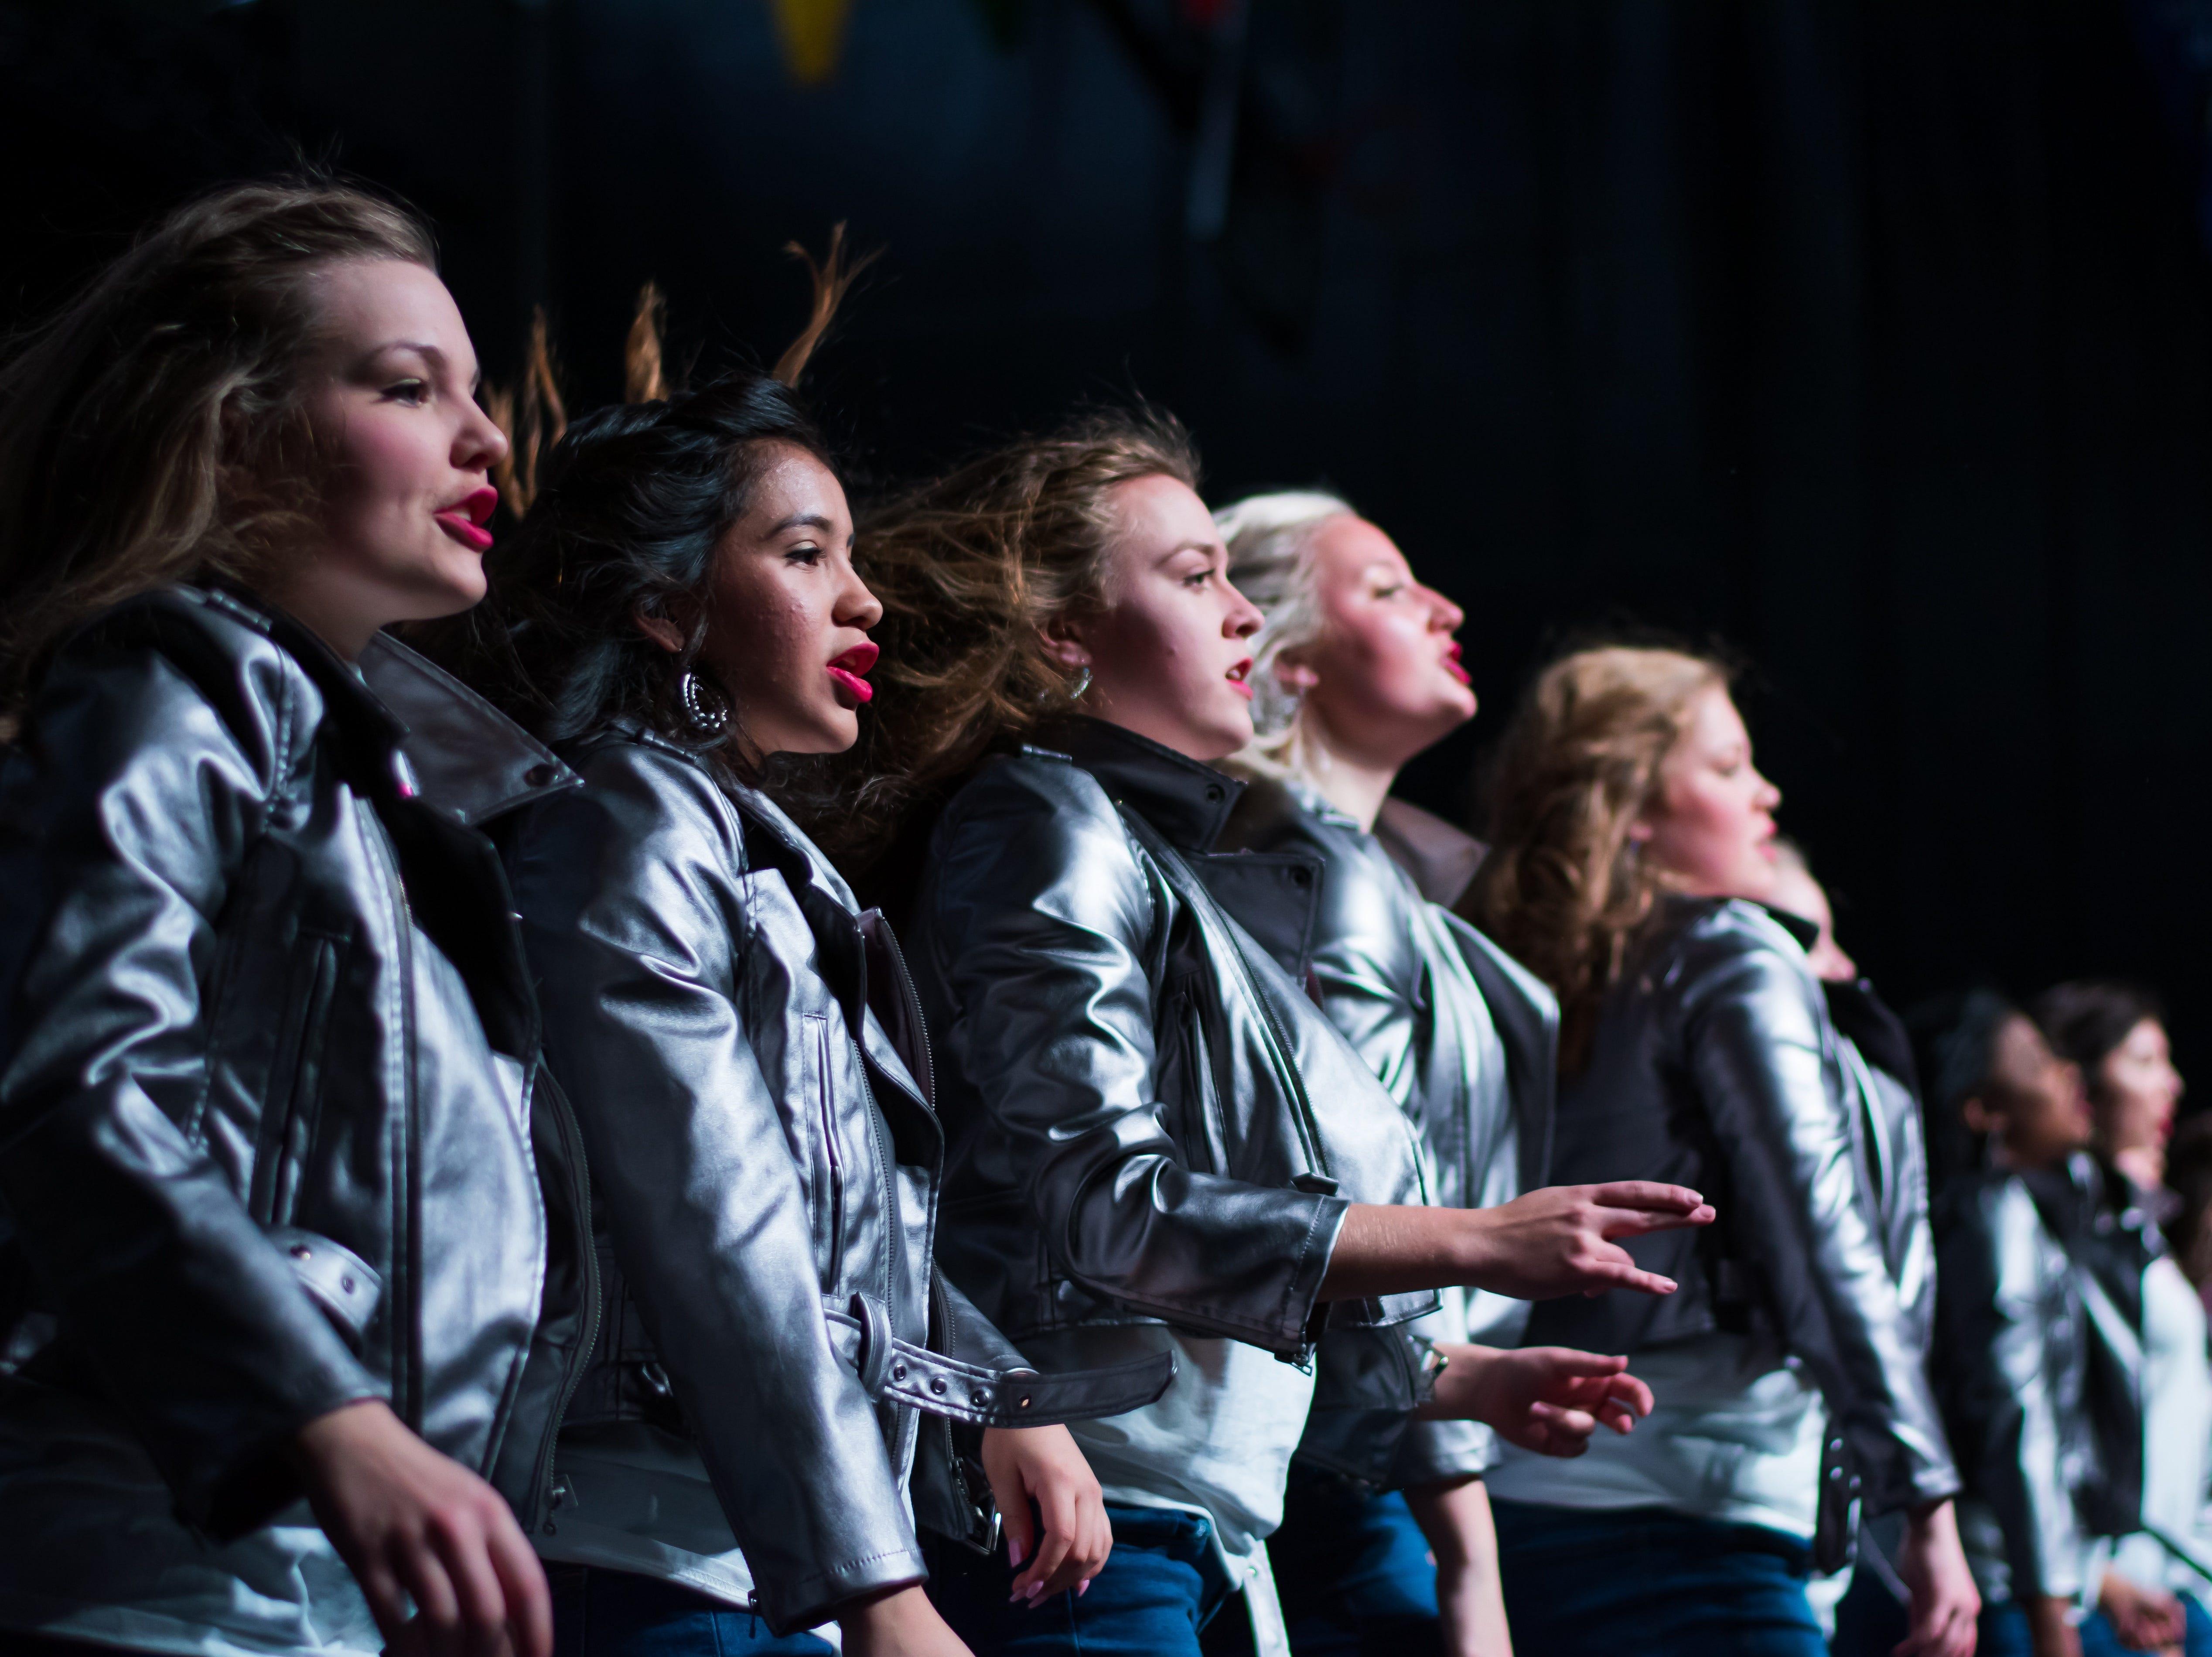 Waukee show choir group Nova performs on Saturday, Jan. 12, 2019 at the Waukee Star Struck Show Choir Invitational in the Waukee High School Field House.